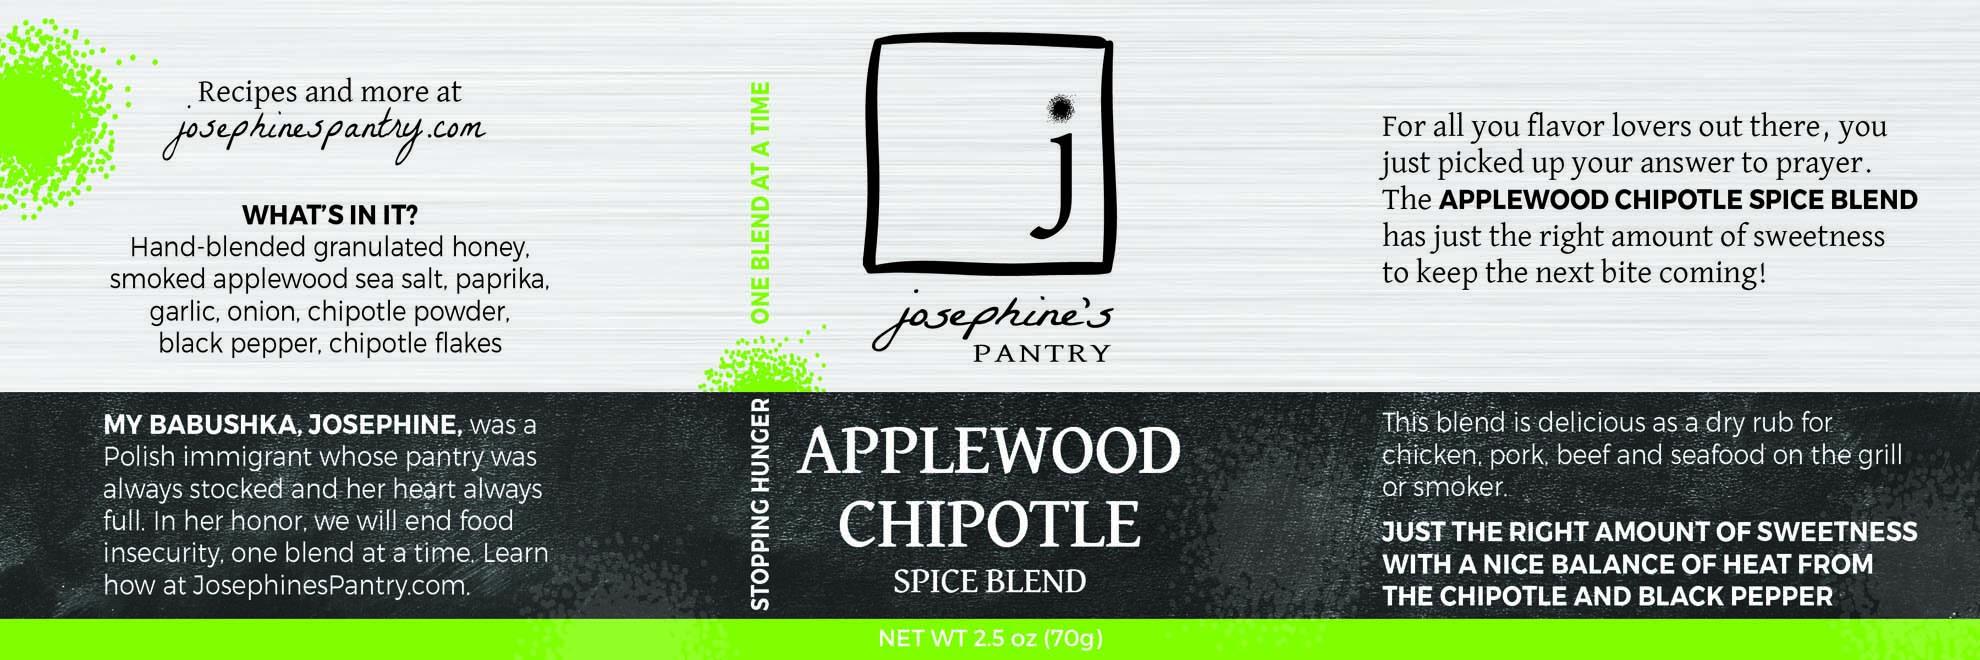 Josephines Pantry Applewood Chipotle.jpg